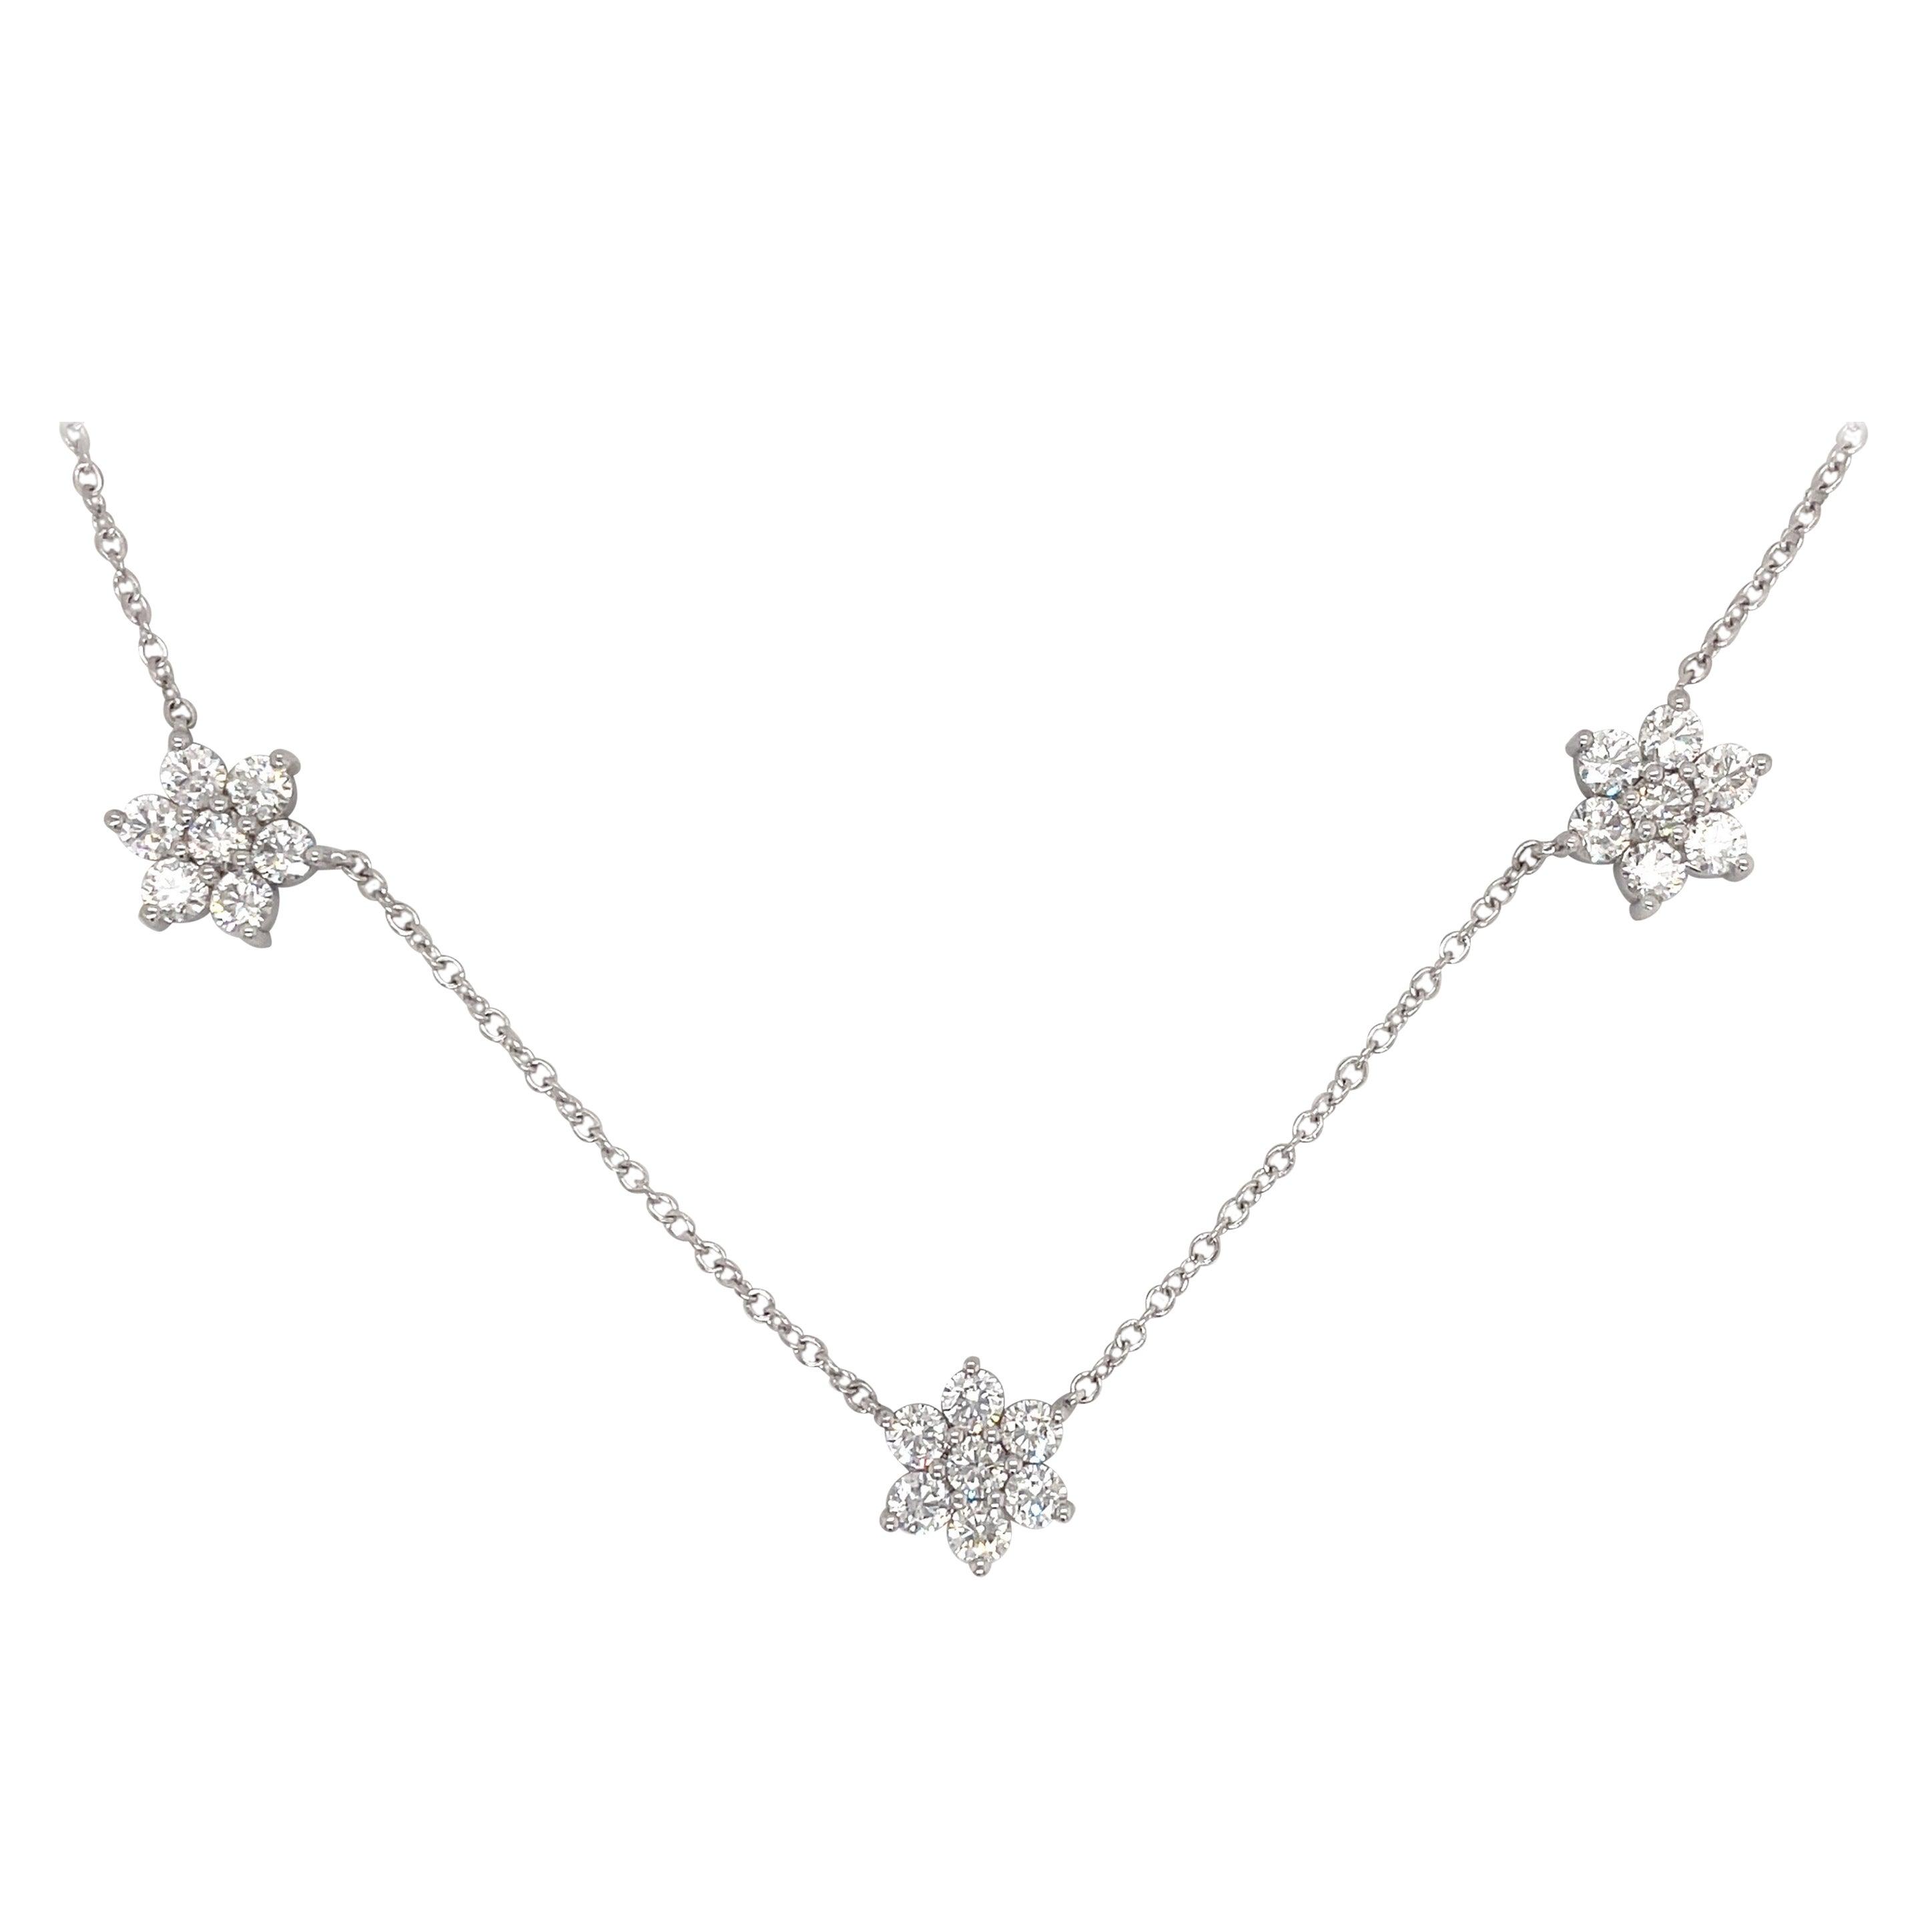 Diamond Cluster Necklace 3.08 Carats 14 Karat White Gold